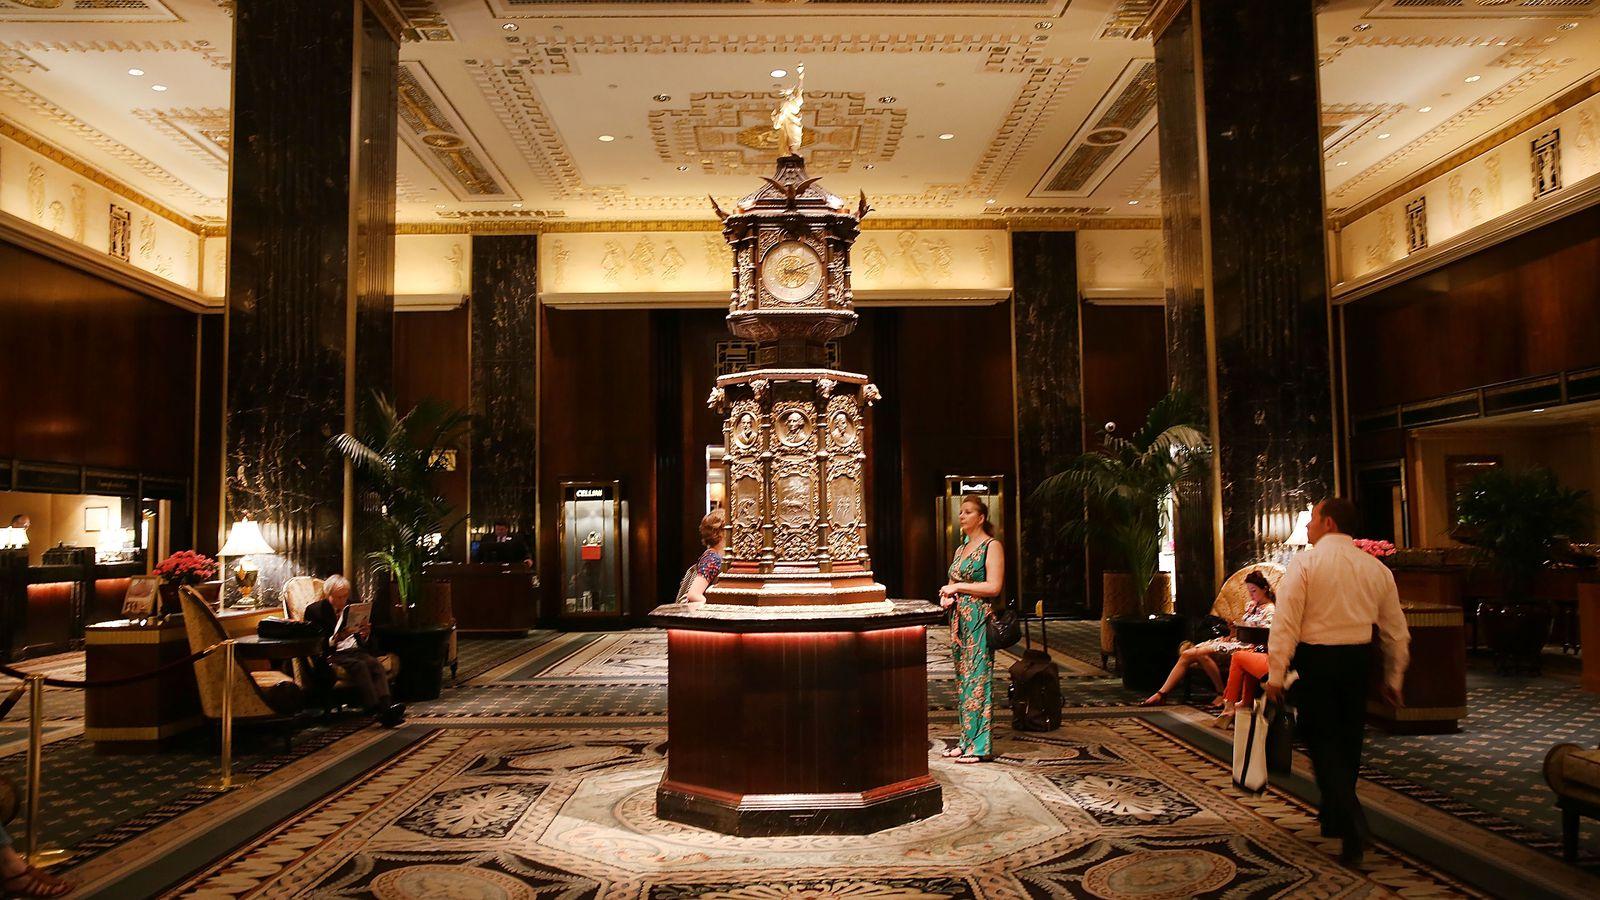 waldorf astoria u0026 39 s iconic art deco interiors become an nyc